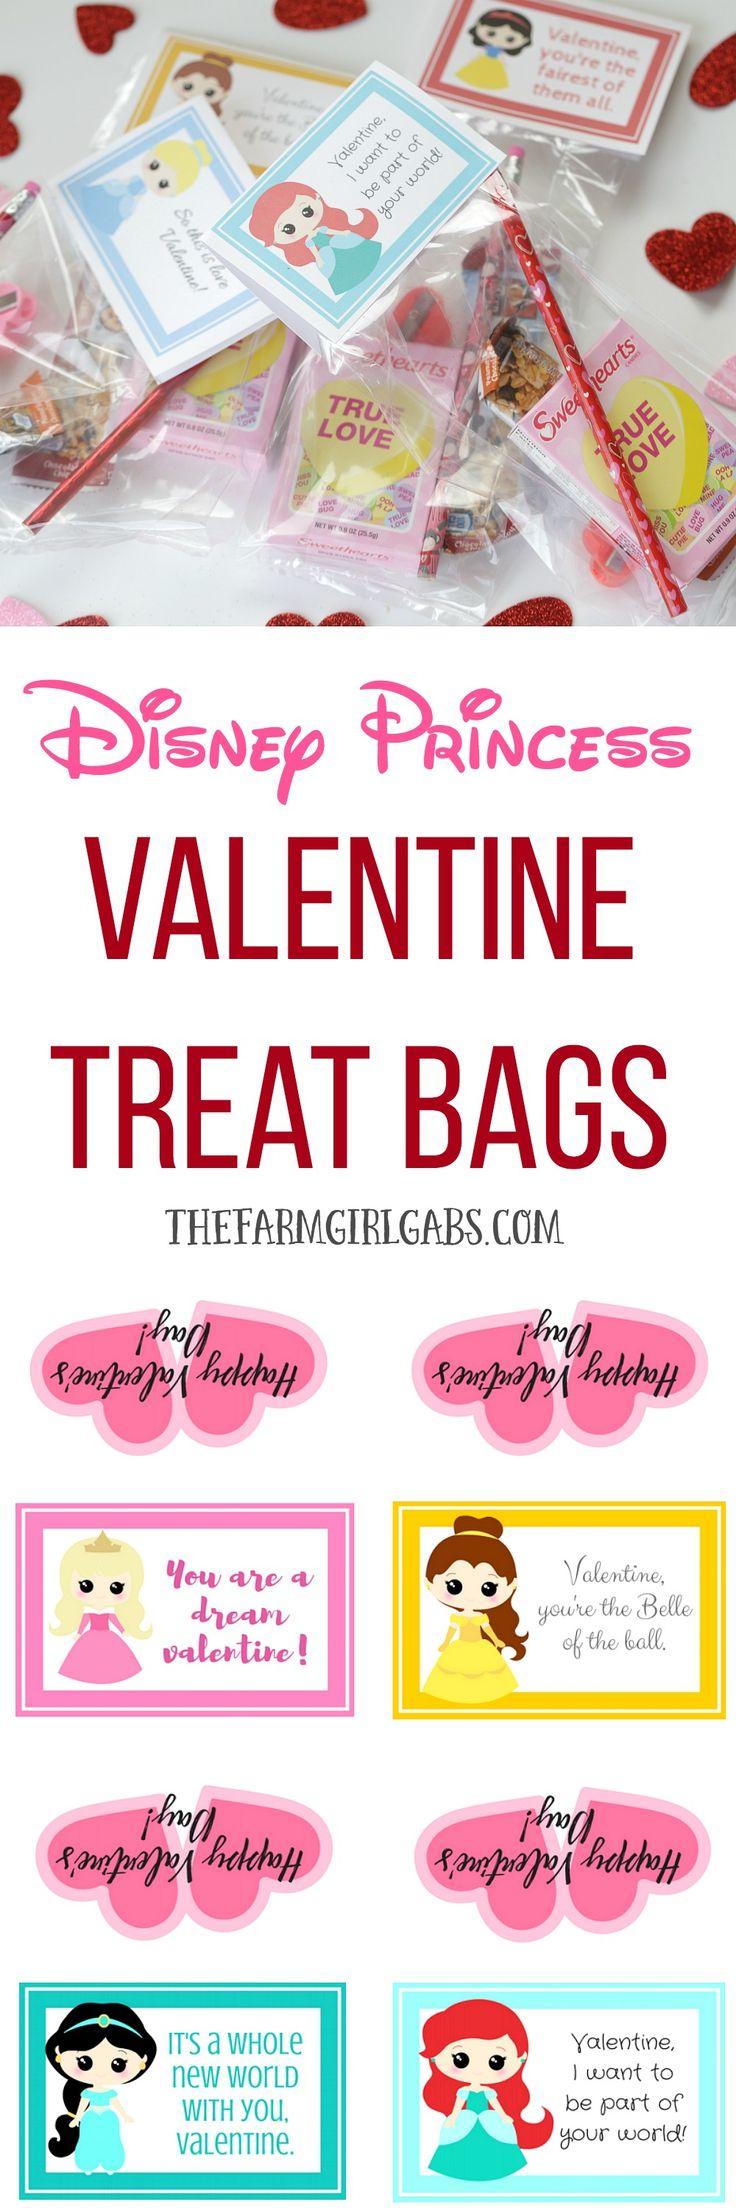 323 best Valentines Day images on Pinterest  DIY Doll and El amor